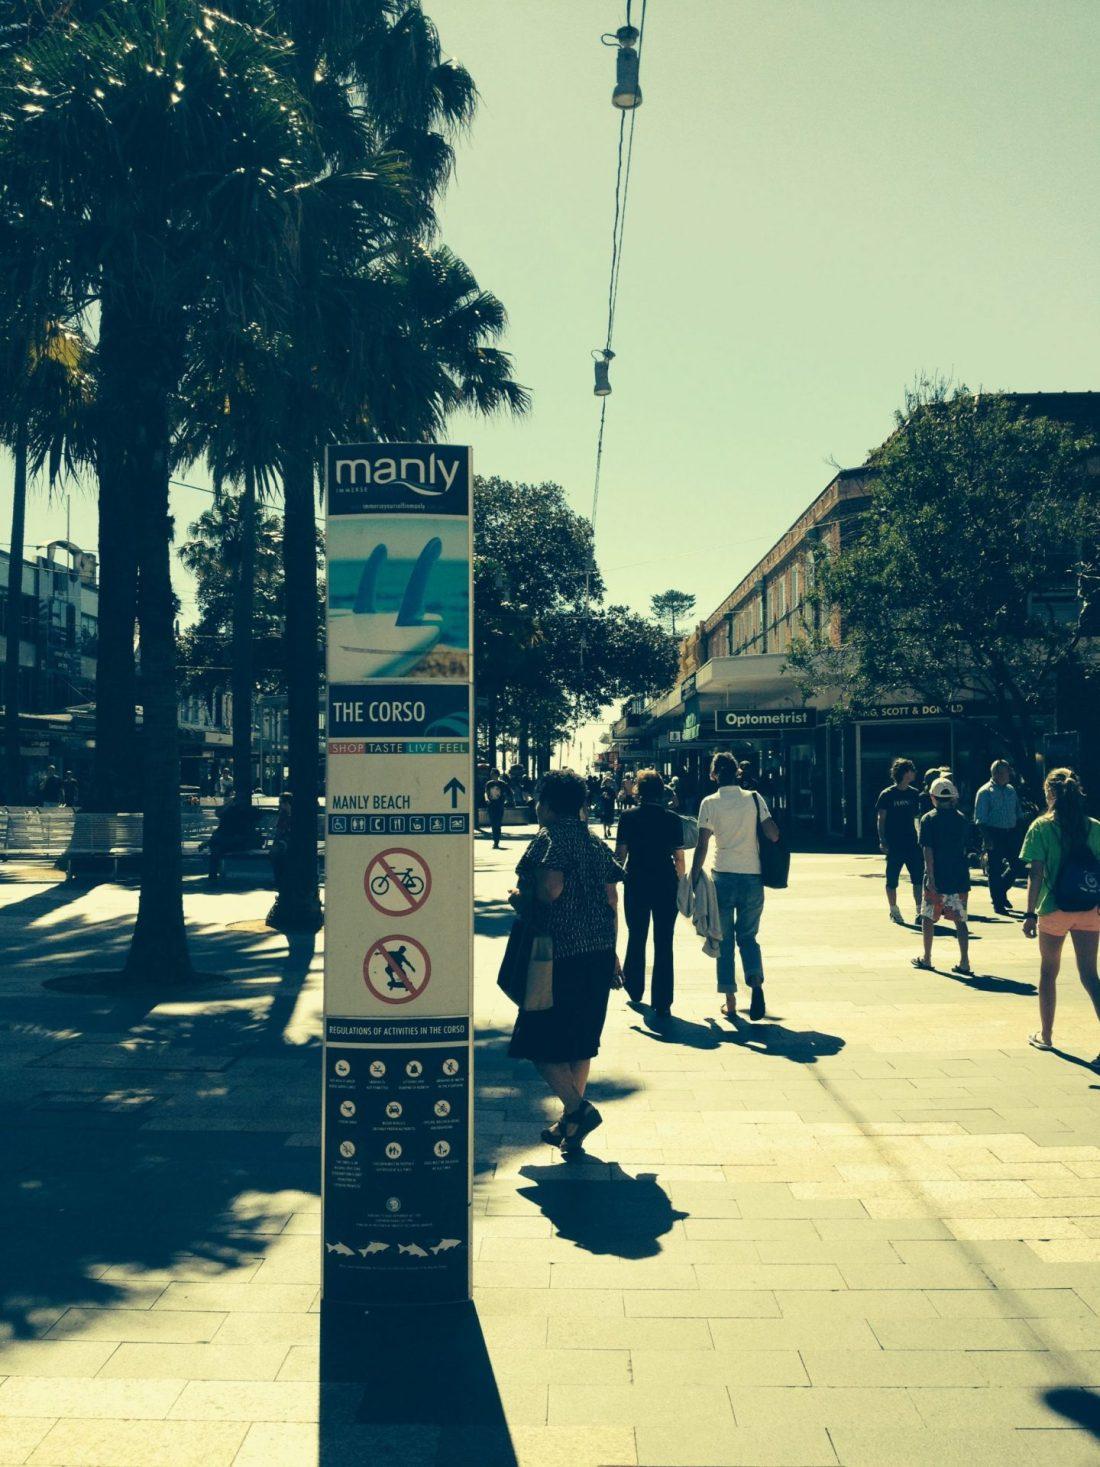 Promenade of Manly, Sydney